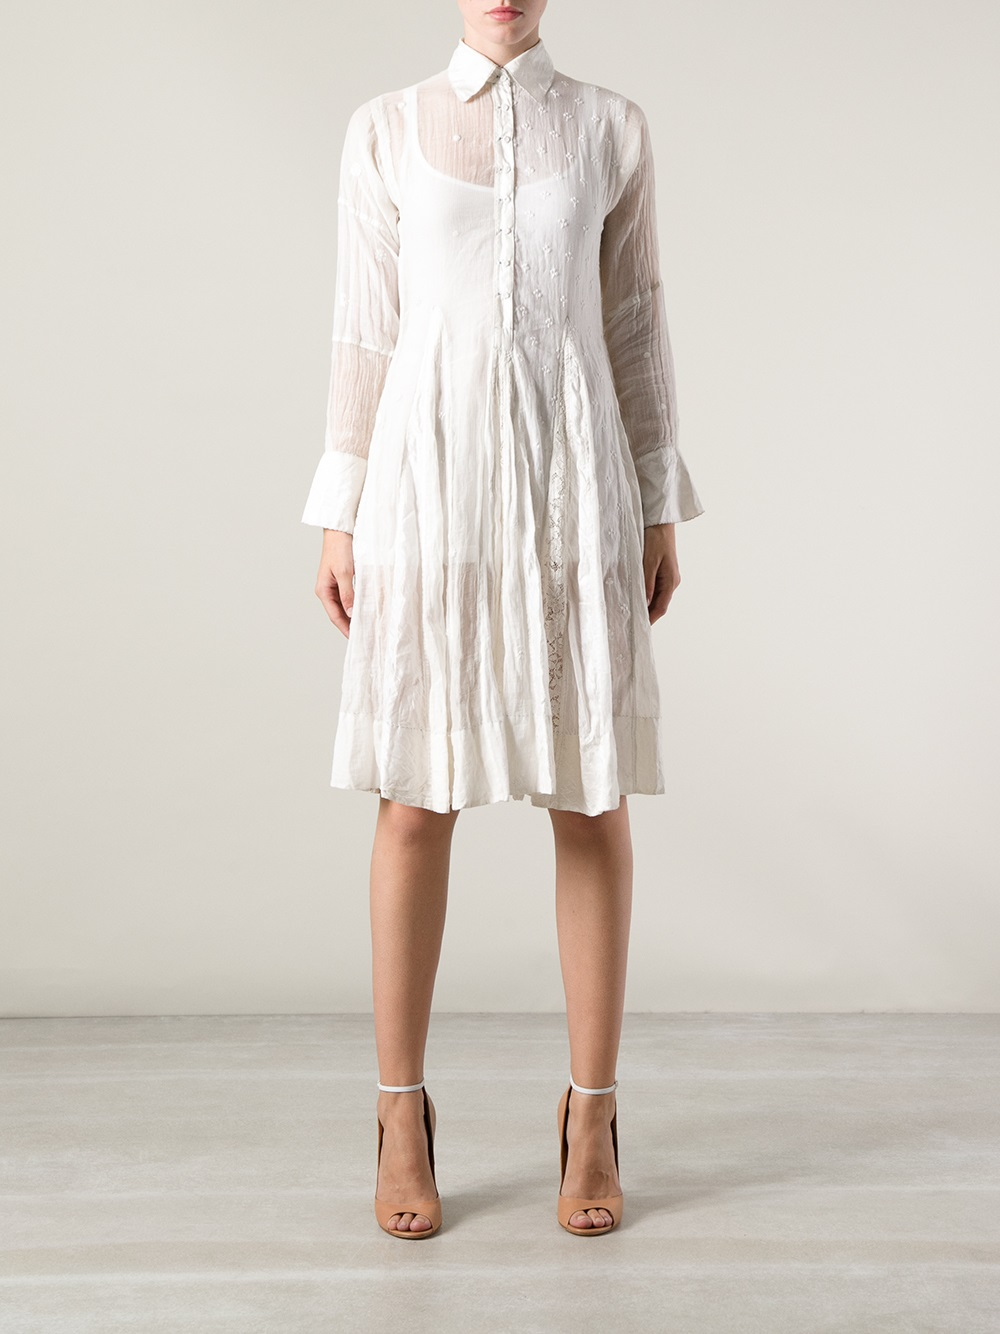 Péro Crochet Blouse Dress in White | Lyst